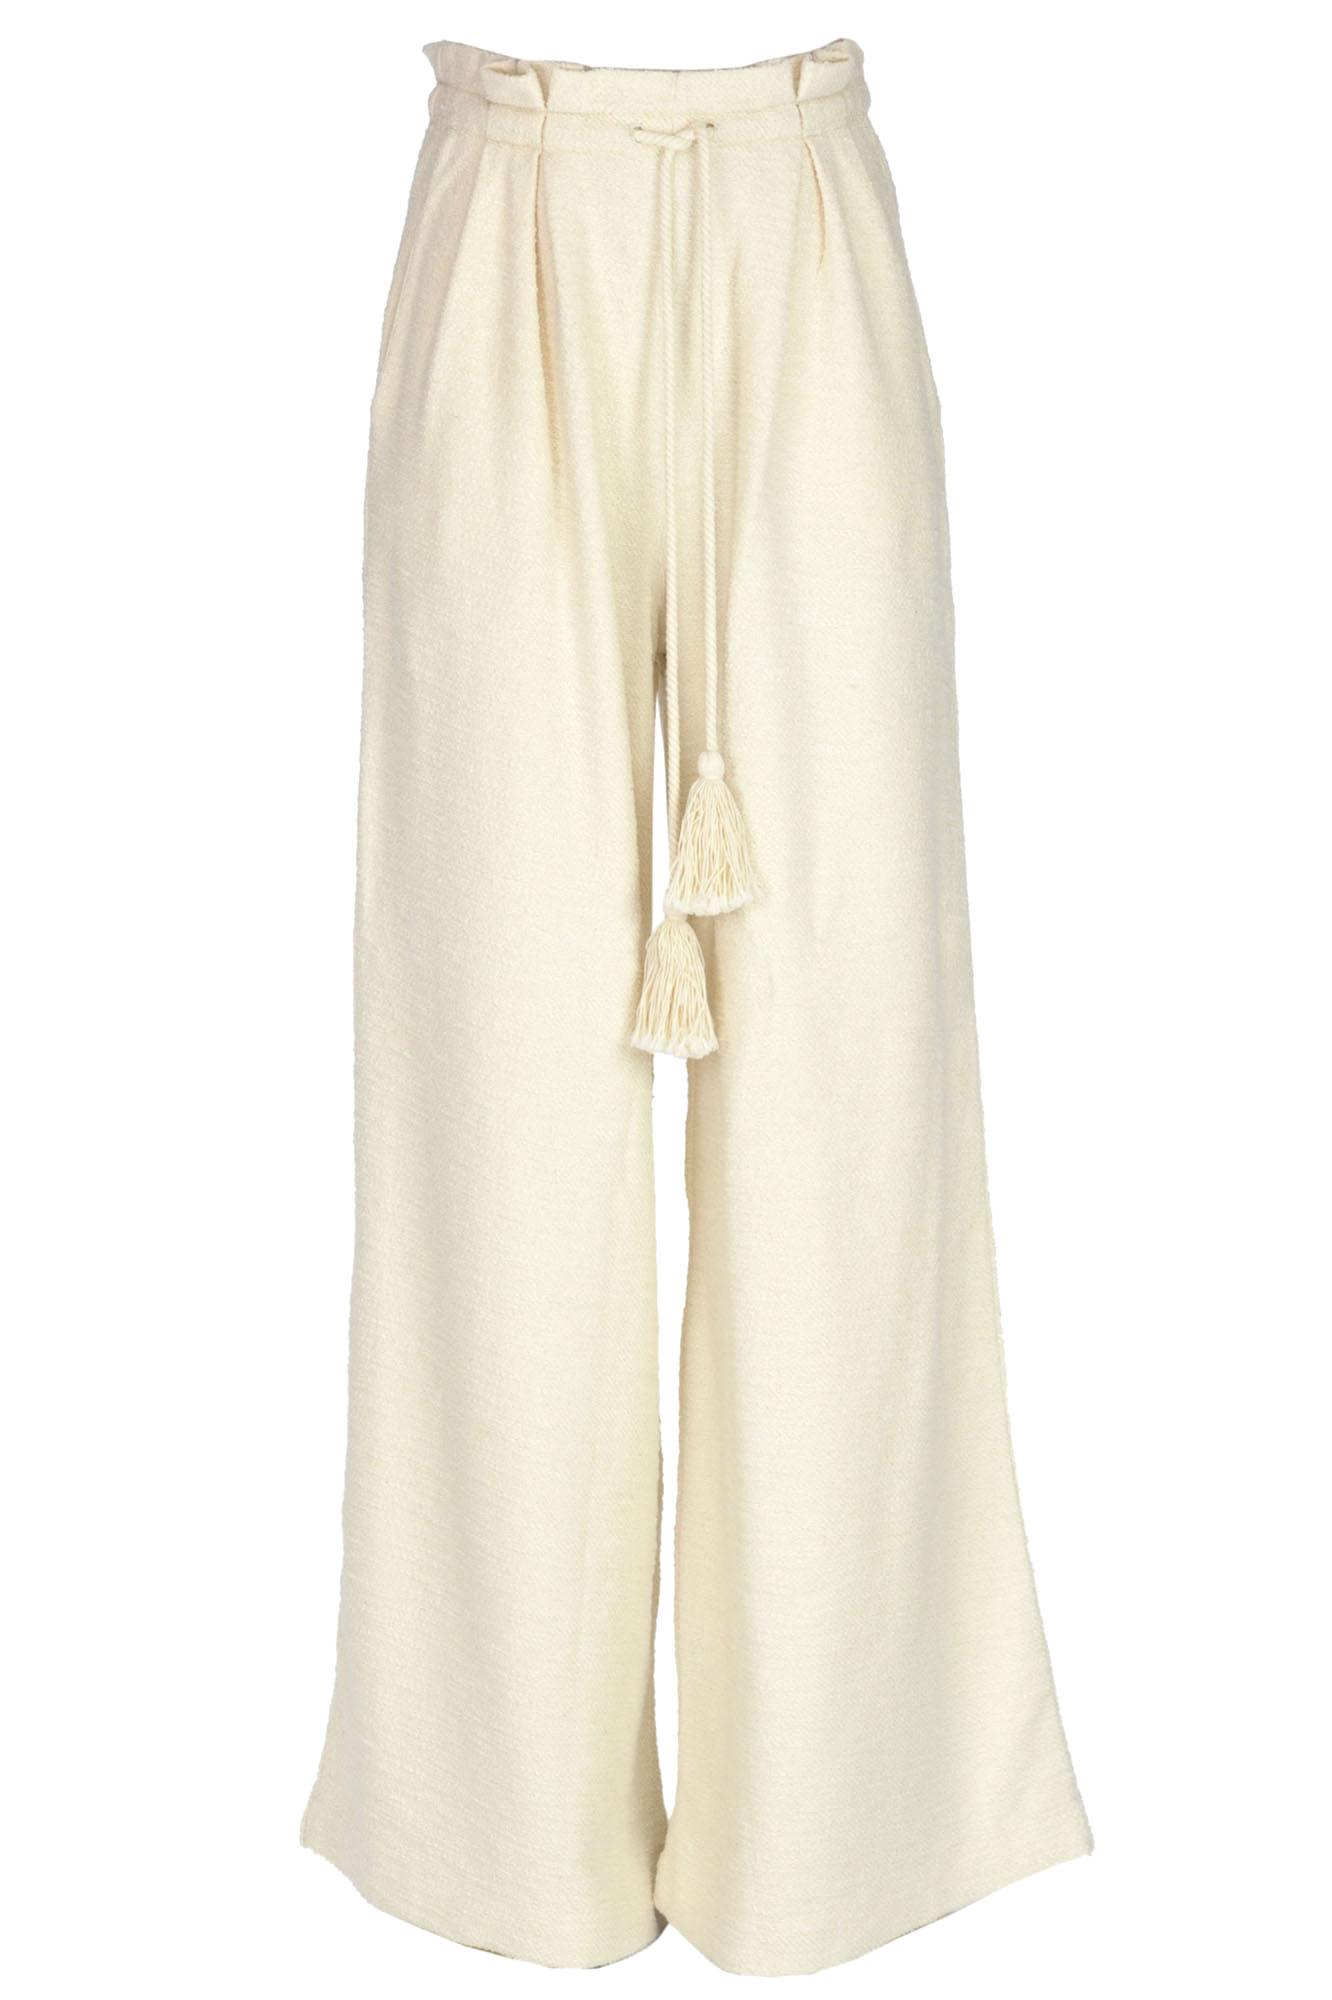 Ulla Johnson Oversized Cotton Trousers In Cream